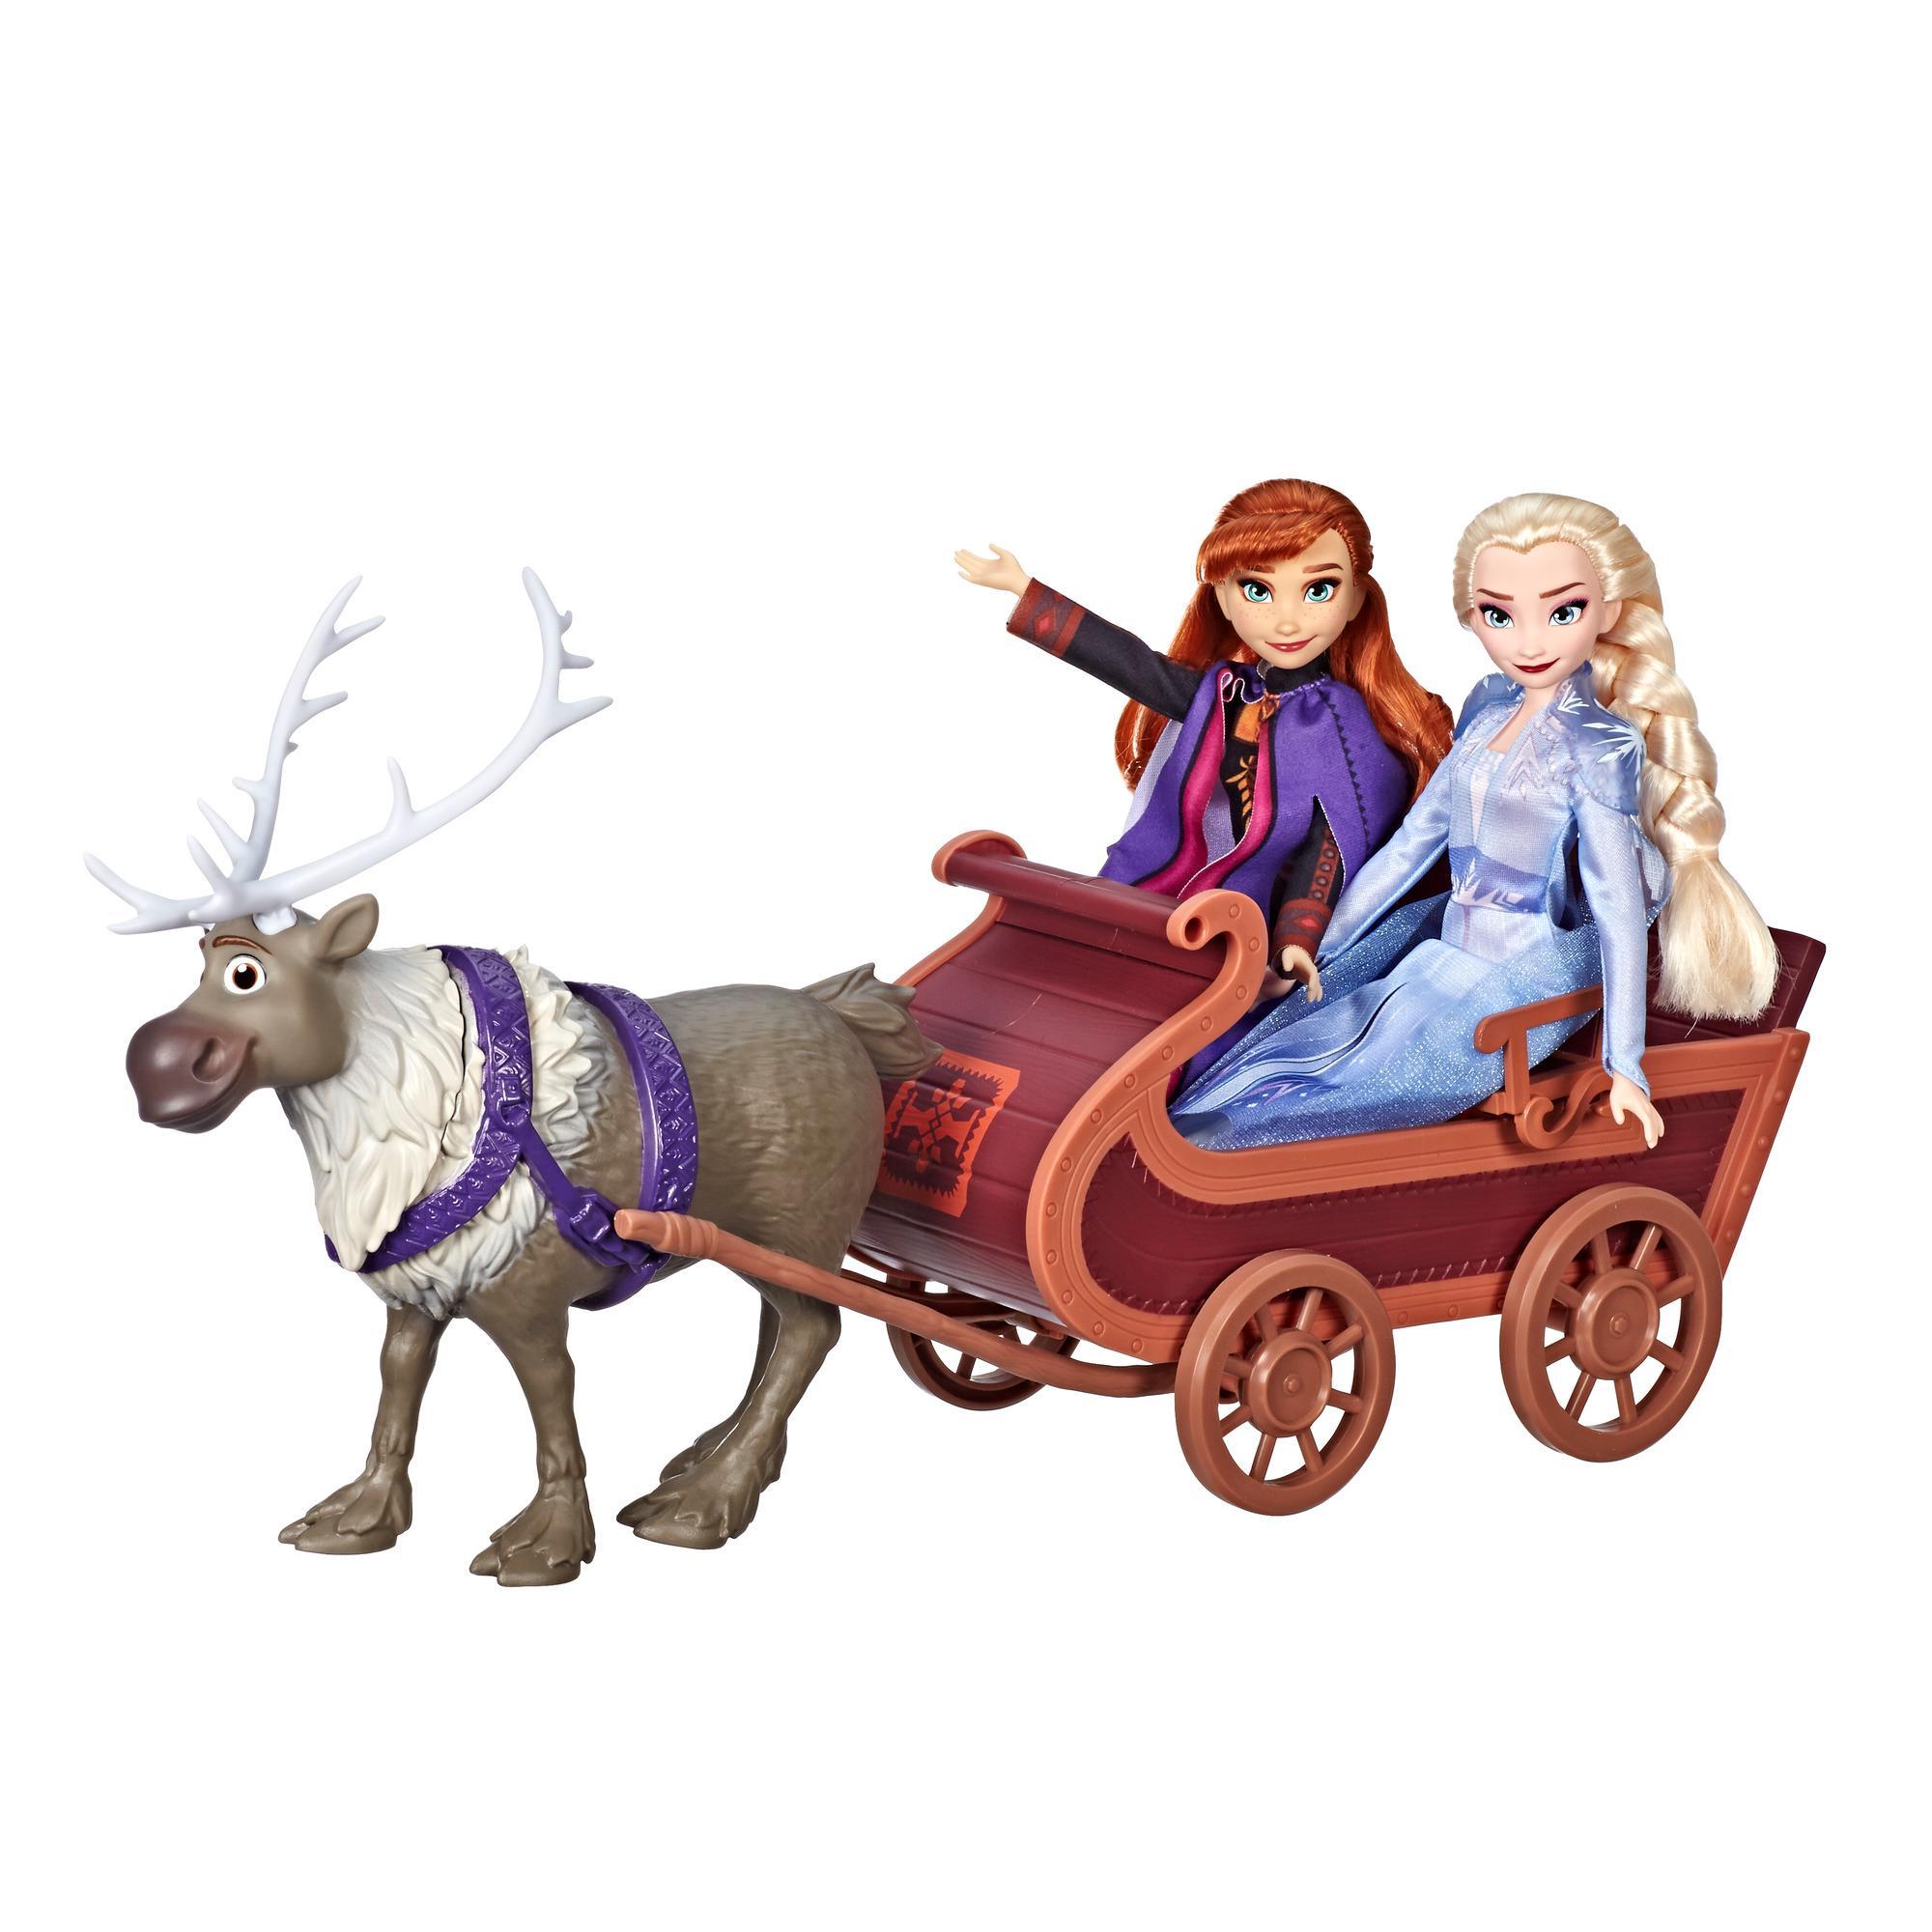 Disney Frozen Sledding Sven and Sisters Elsa and Anna Fashion Dolls